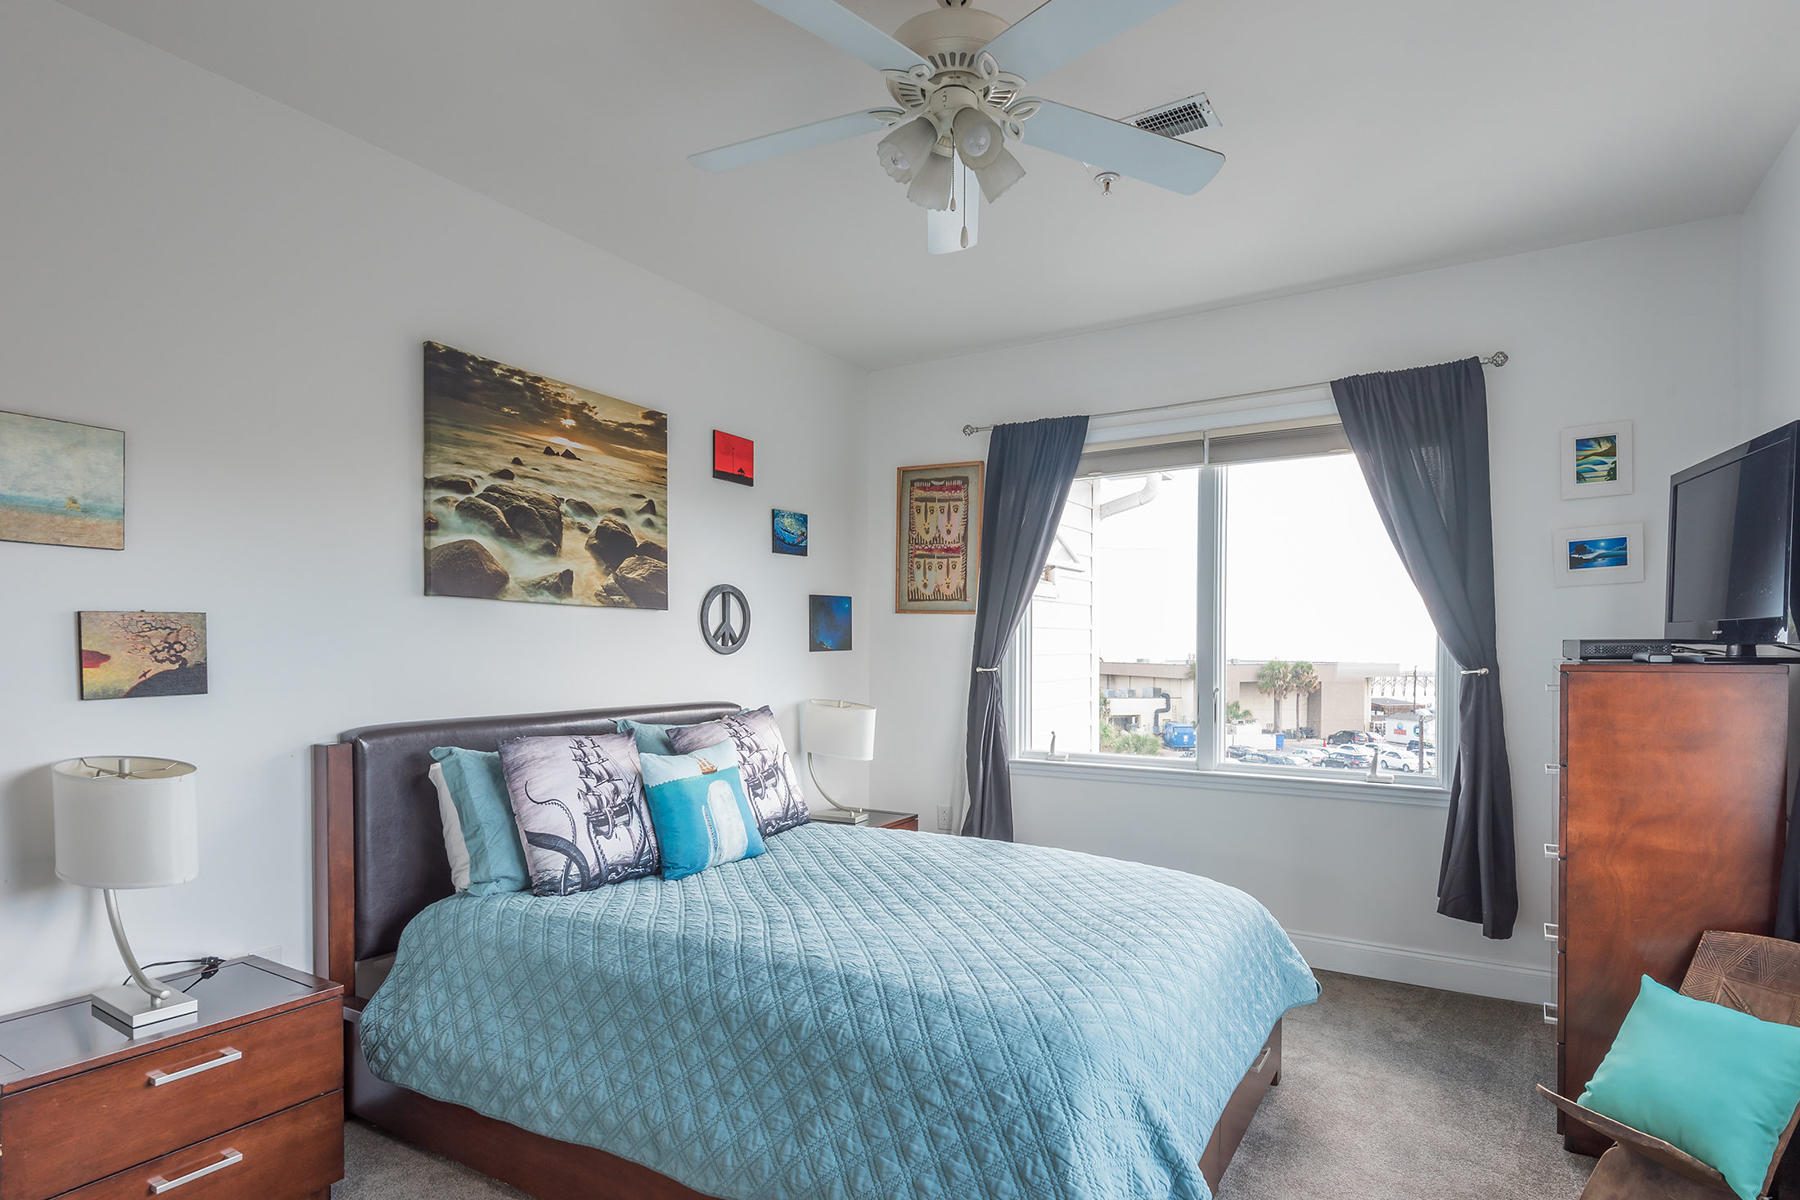 Pier Pointe Villas Homes For Sale - 114 Ashley, Folly Beach, SC - 20